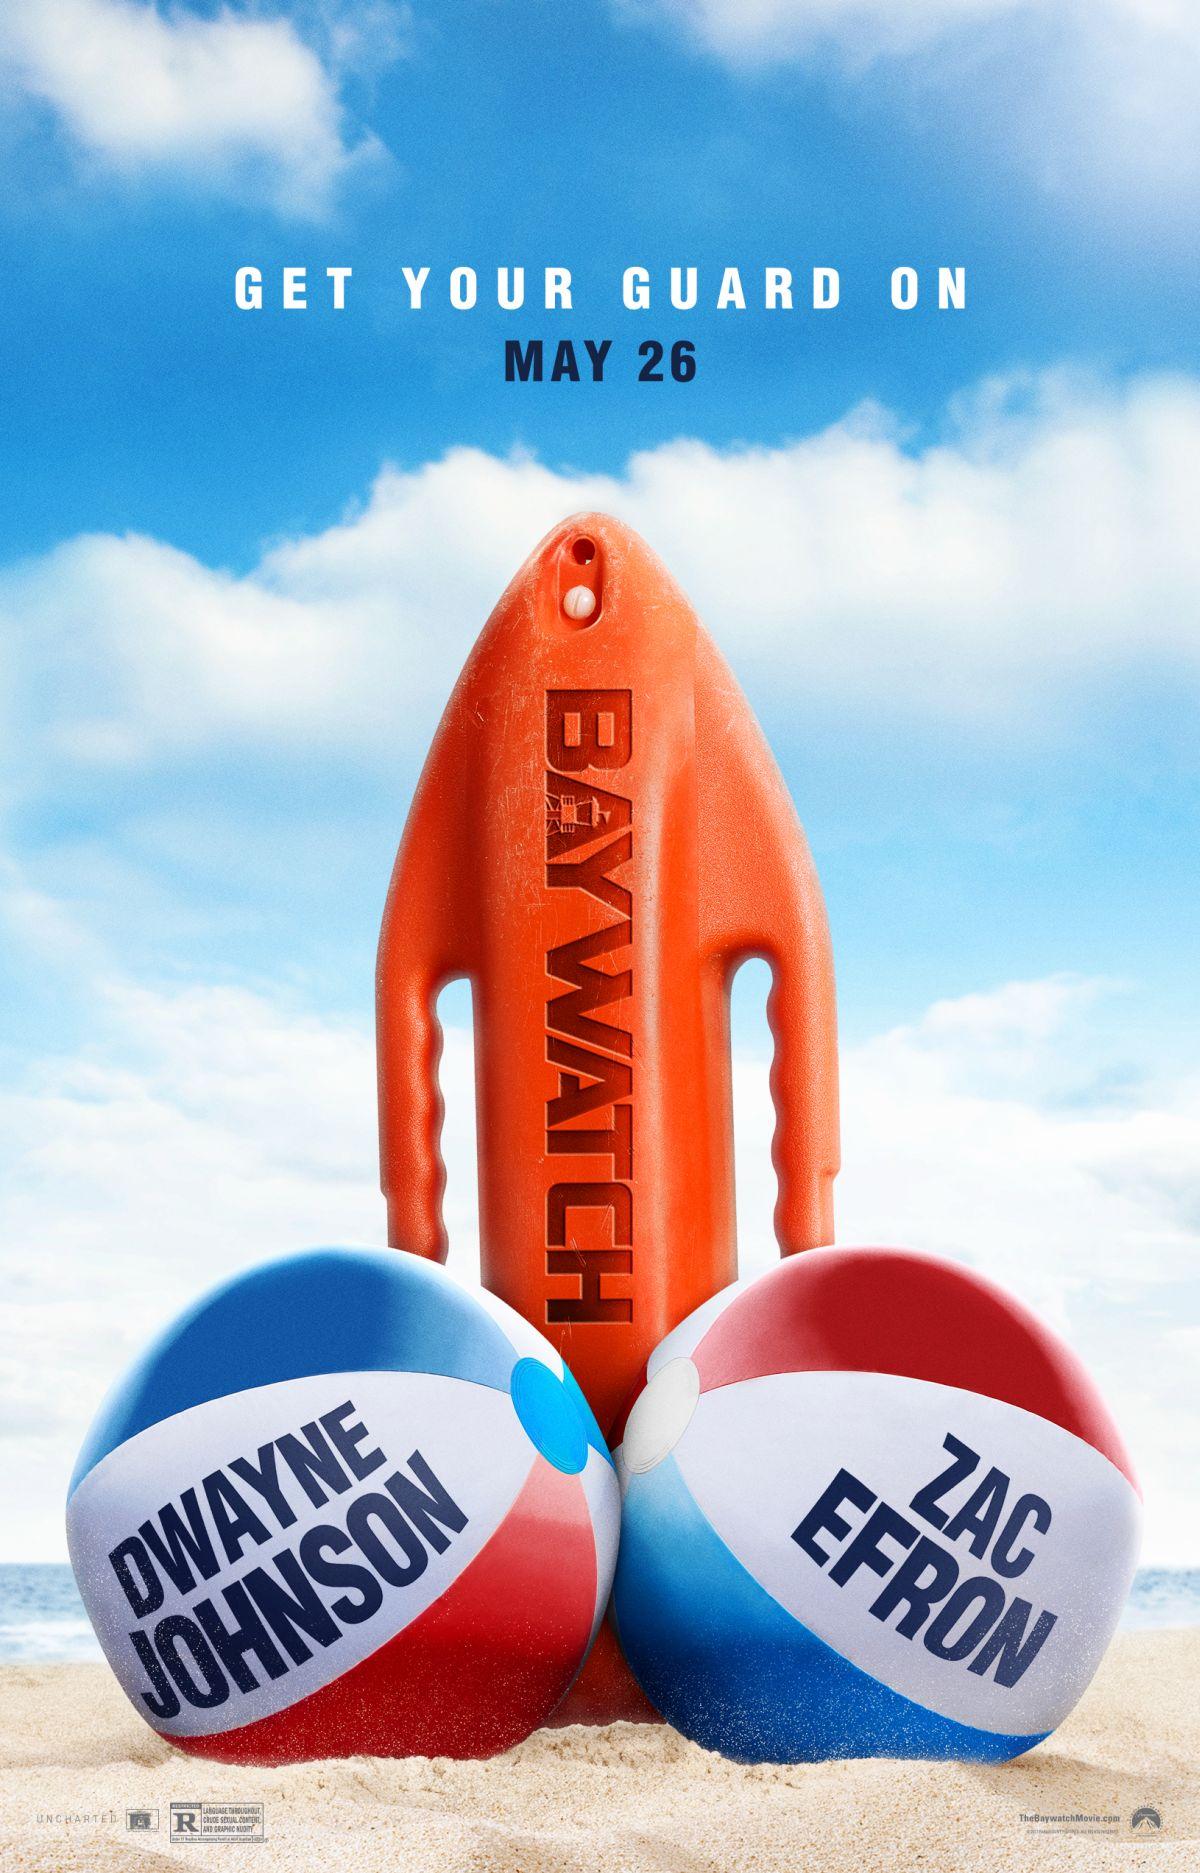 Baywatch: sottili metafore nella nuova locandina